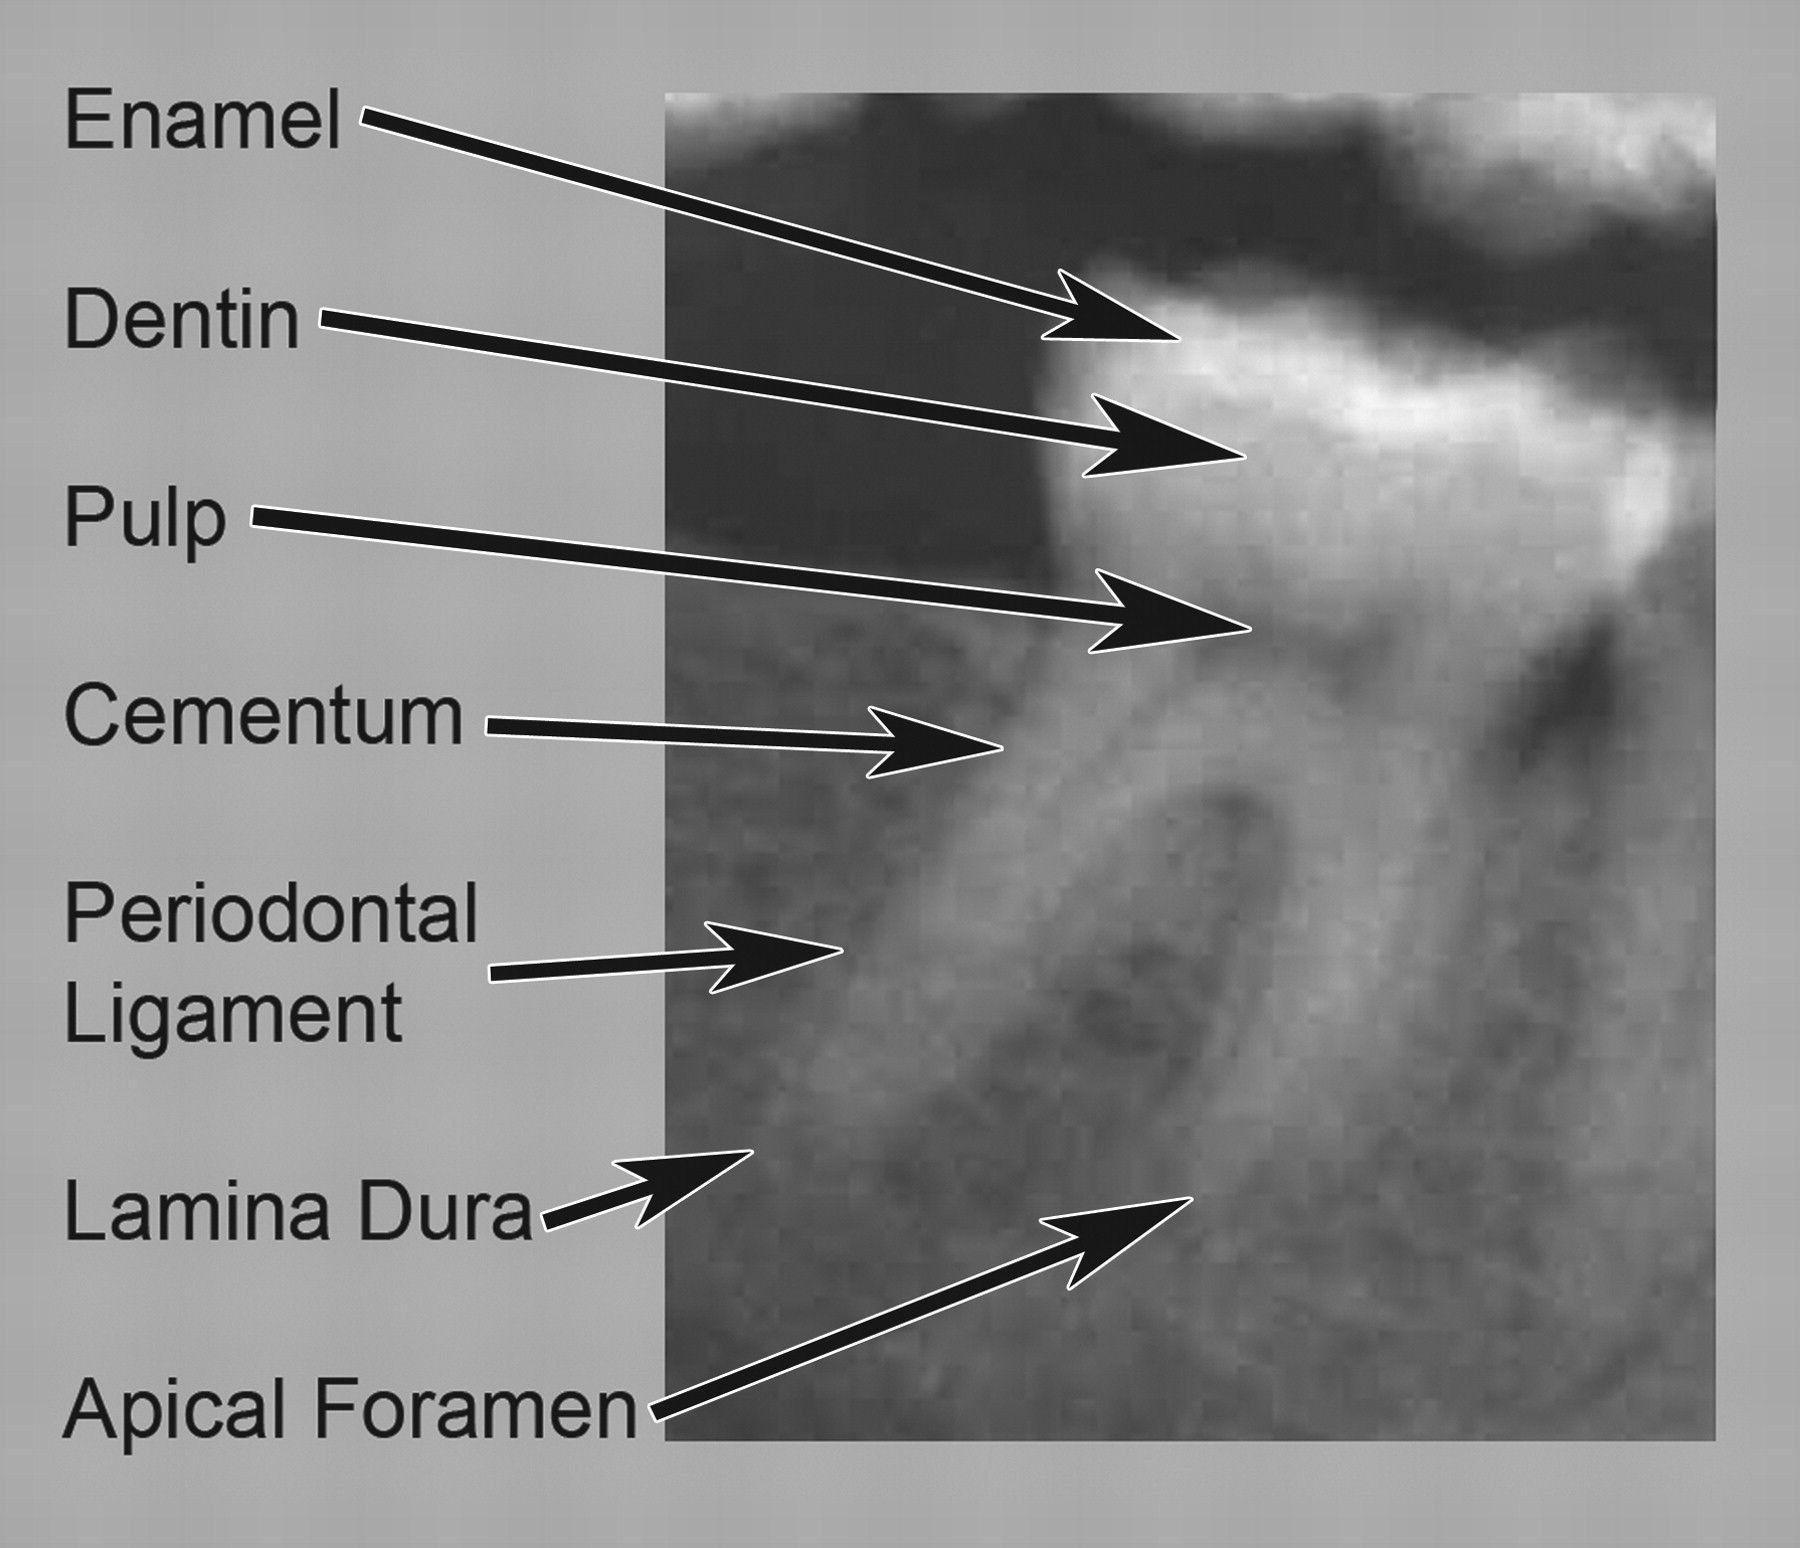 Radiology & Pathology Characteristics